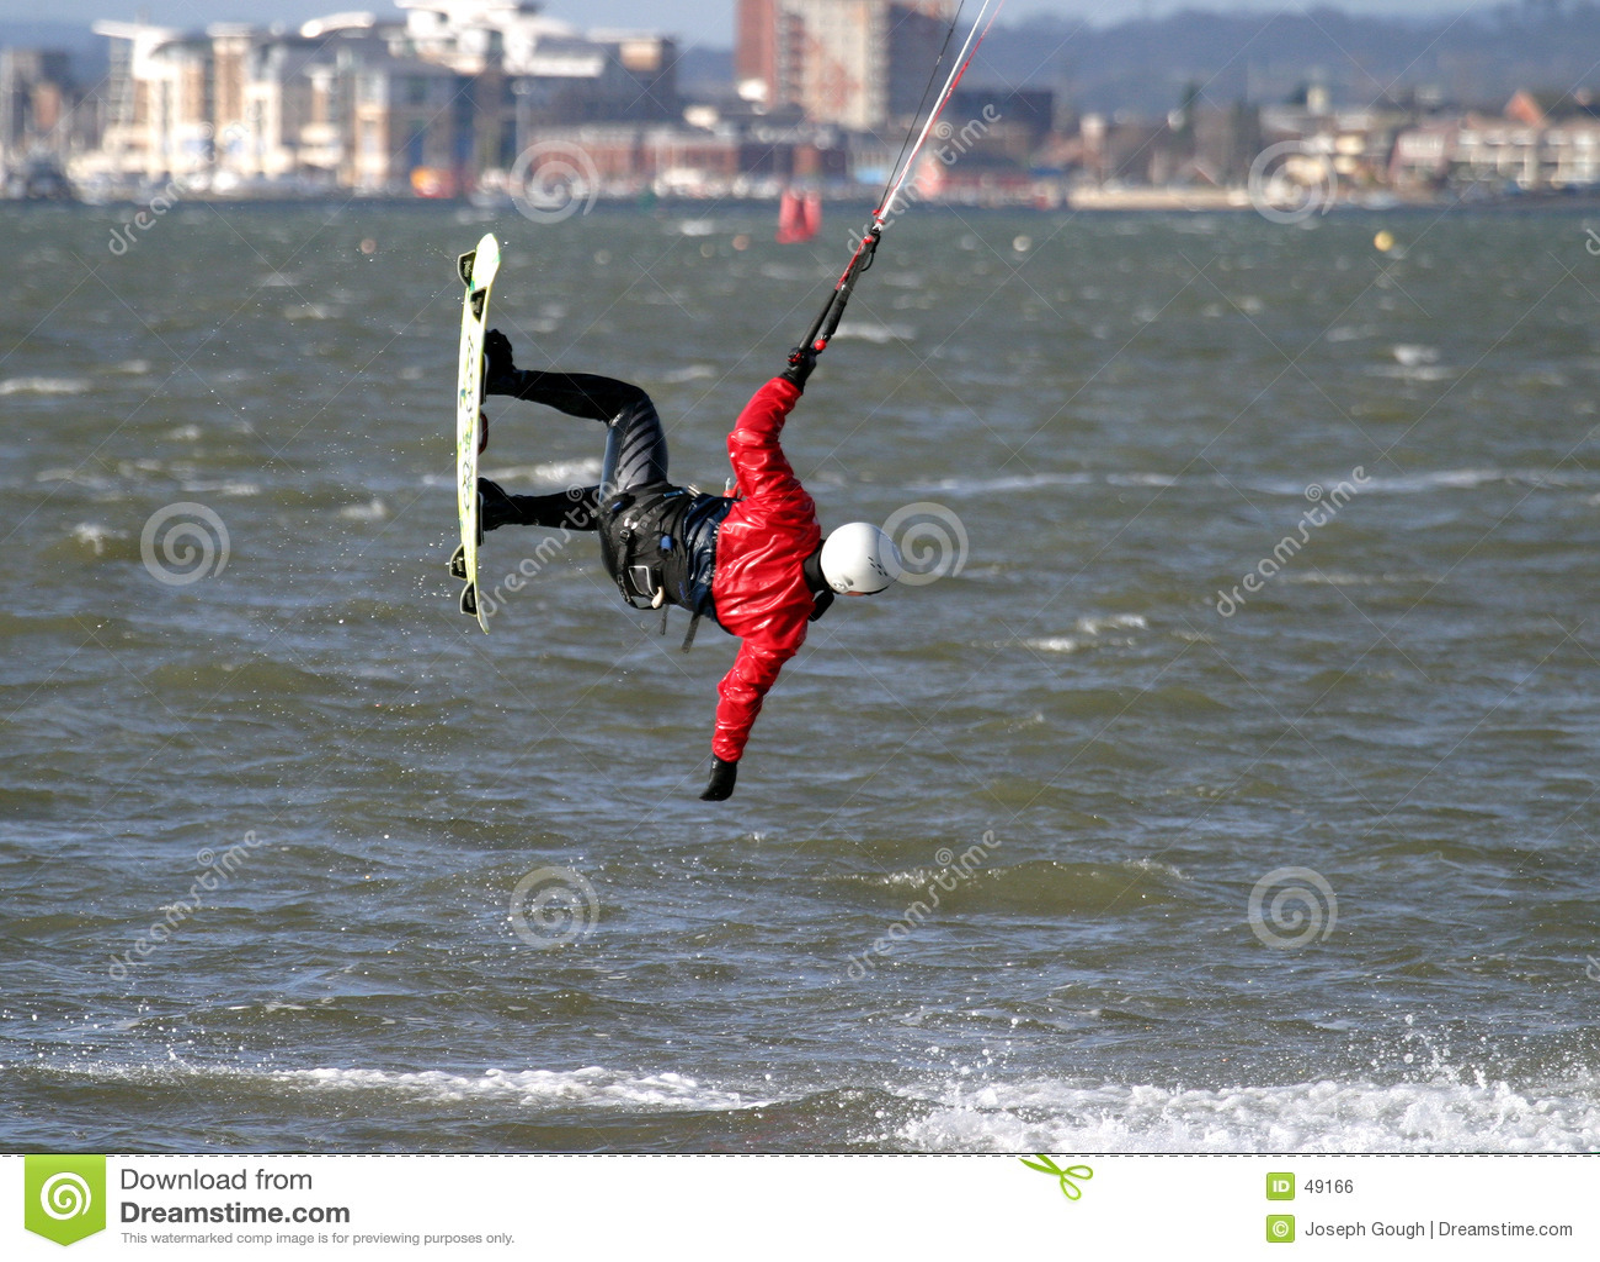 Drachen-Surfer